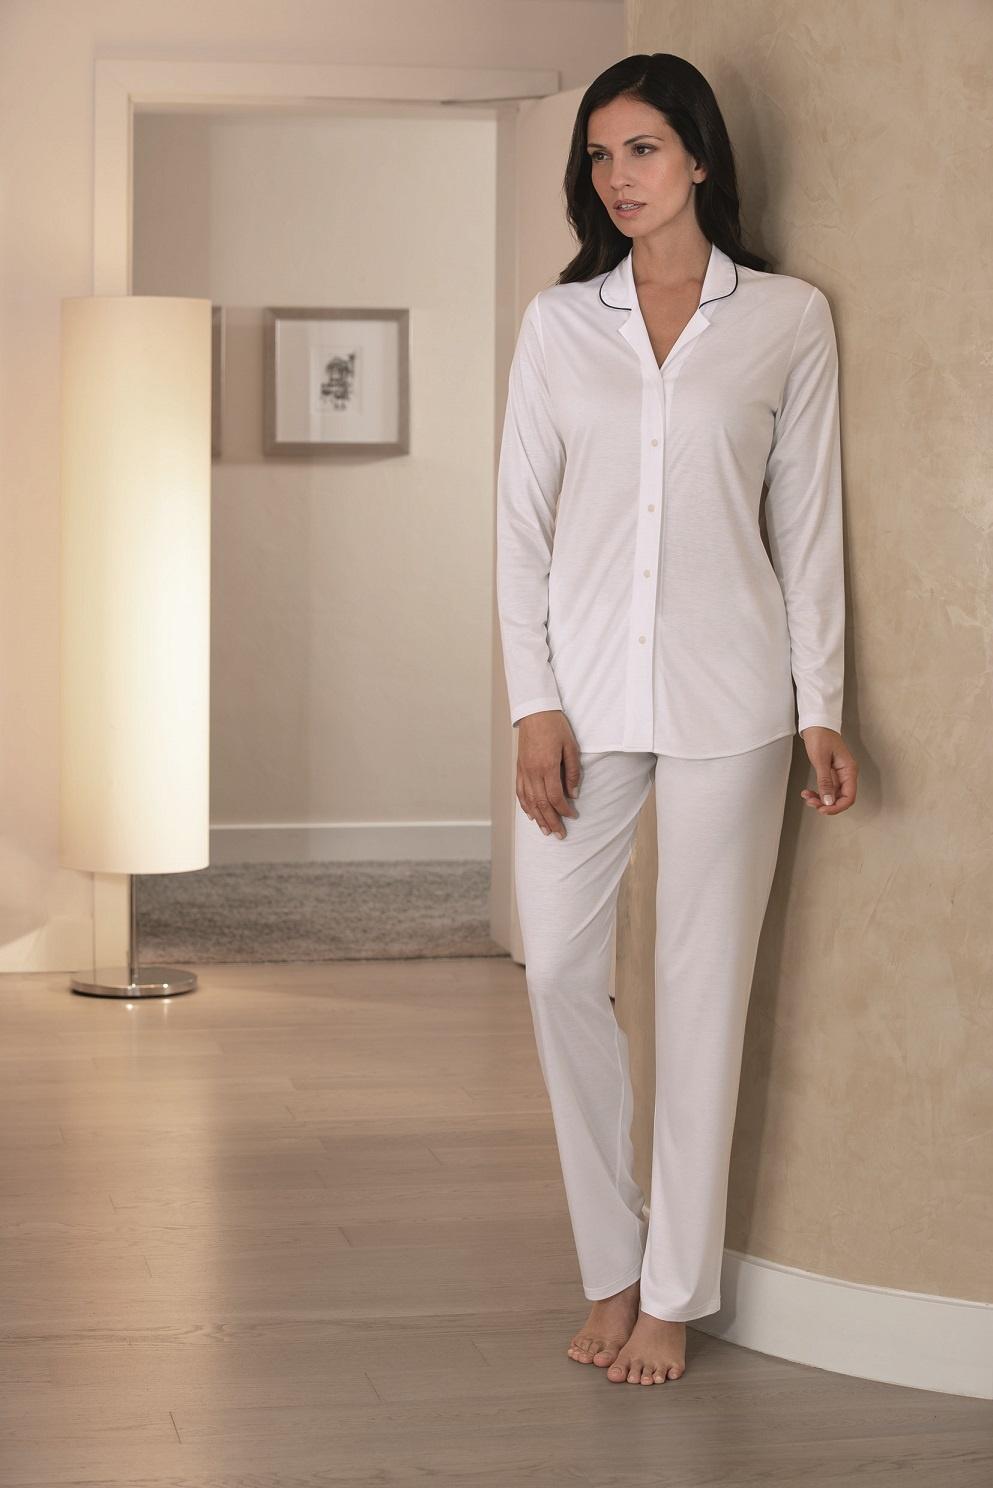 competitive price 42503 a9876 Novila|Damen Jersey|Schlafanzug Jersey|Textile Träume|Jersey Pyjama